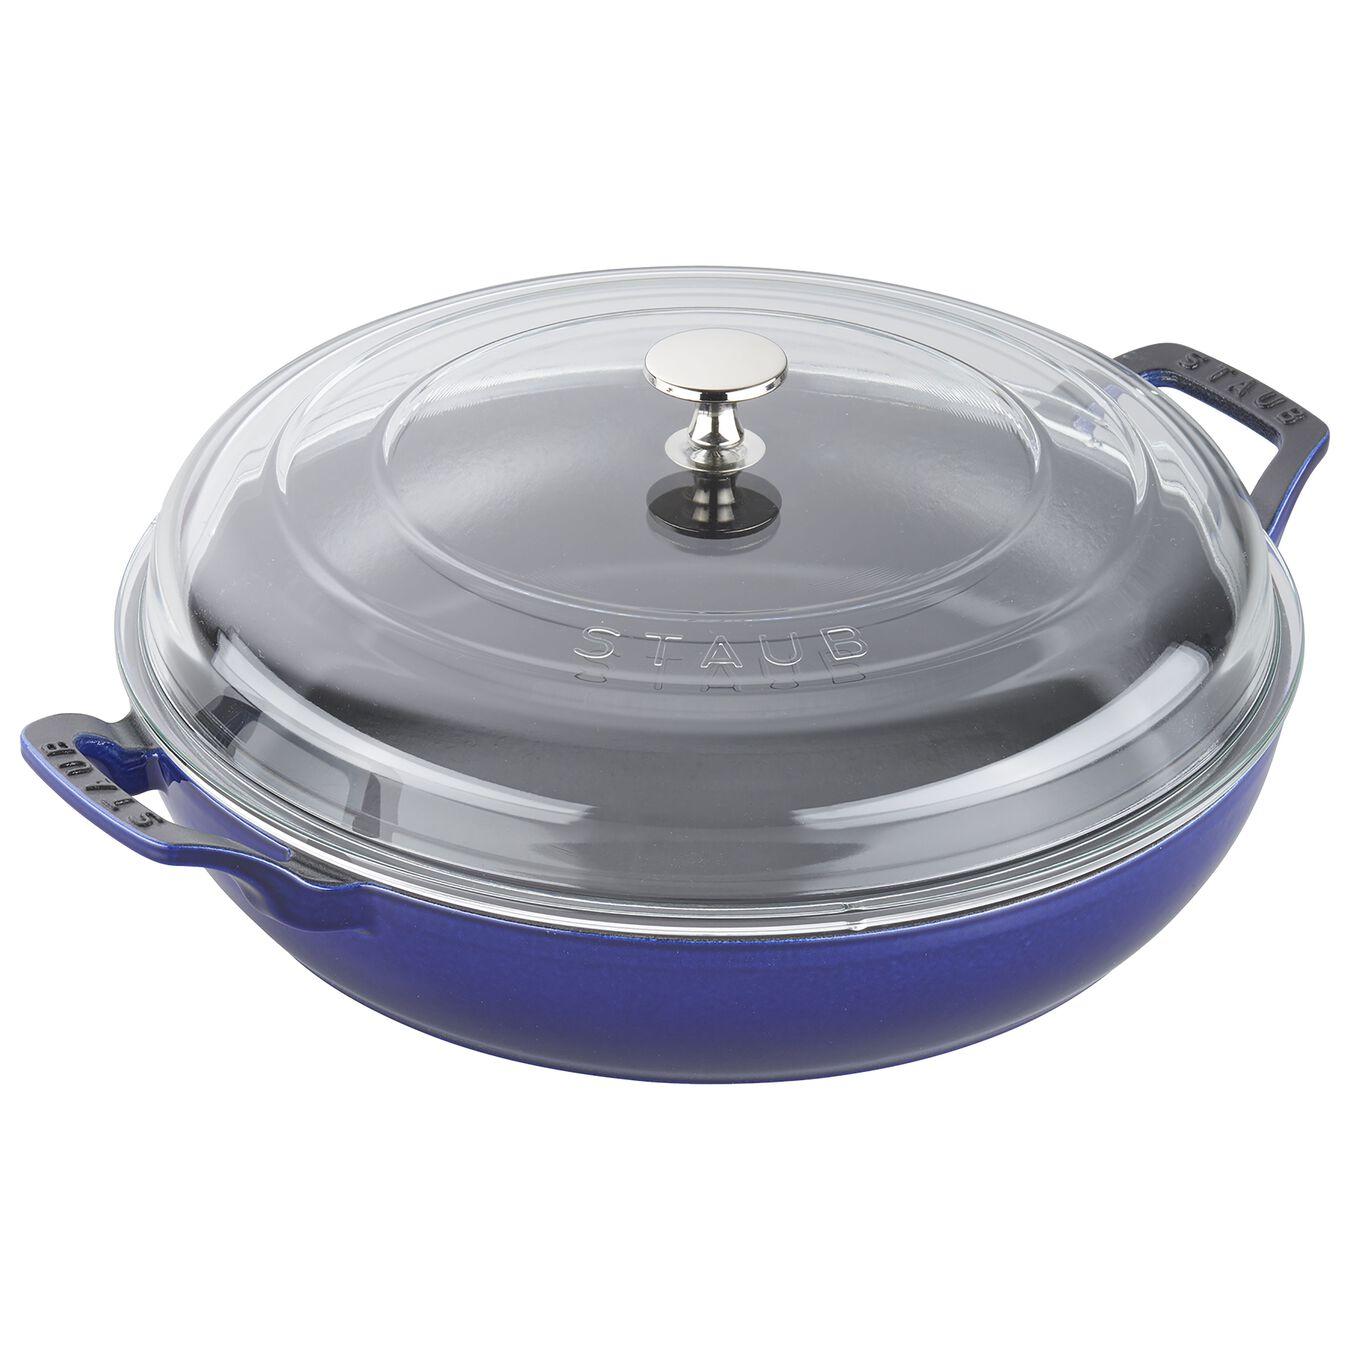 12-inch, Braiser with Glass Lid, dark blue,,large 1